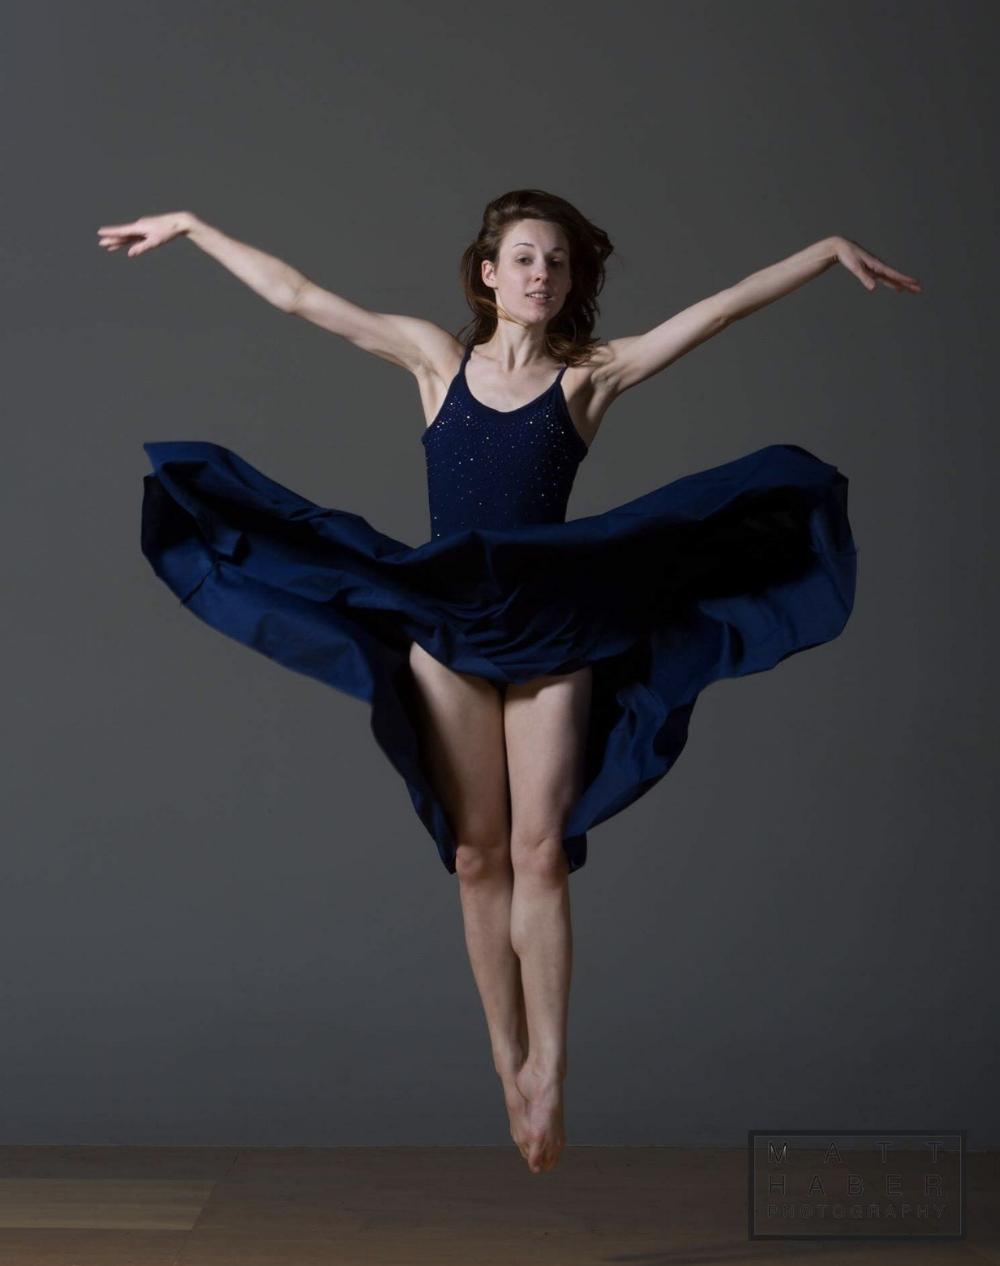 Jordan Colbe, Summer Faculty member teaching Contemporary, Ballet, and Children's classses